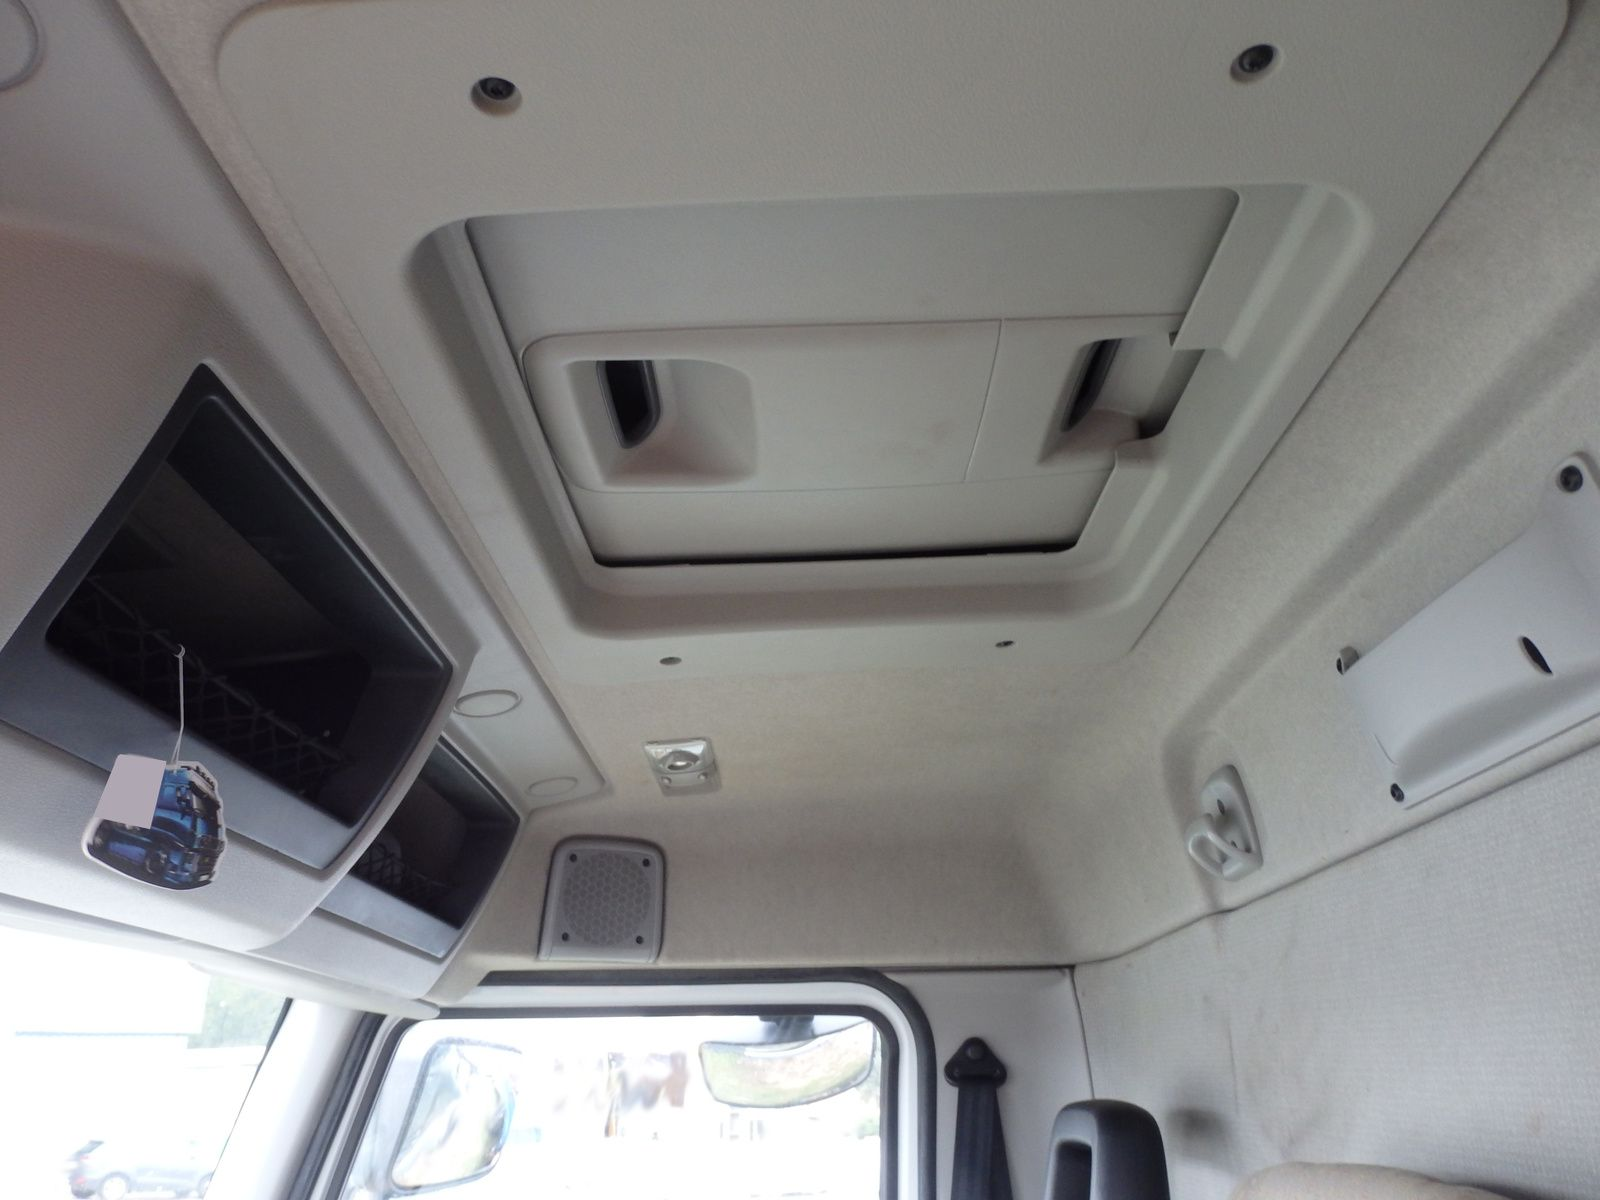 Camion 4x2 Premium Lander 280 DXI 19t Tel: 0608066192 TRANSCOMM13 Pierre BASSAT